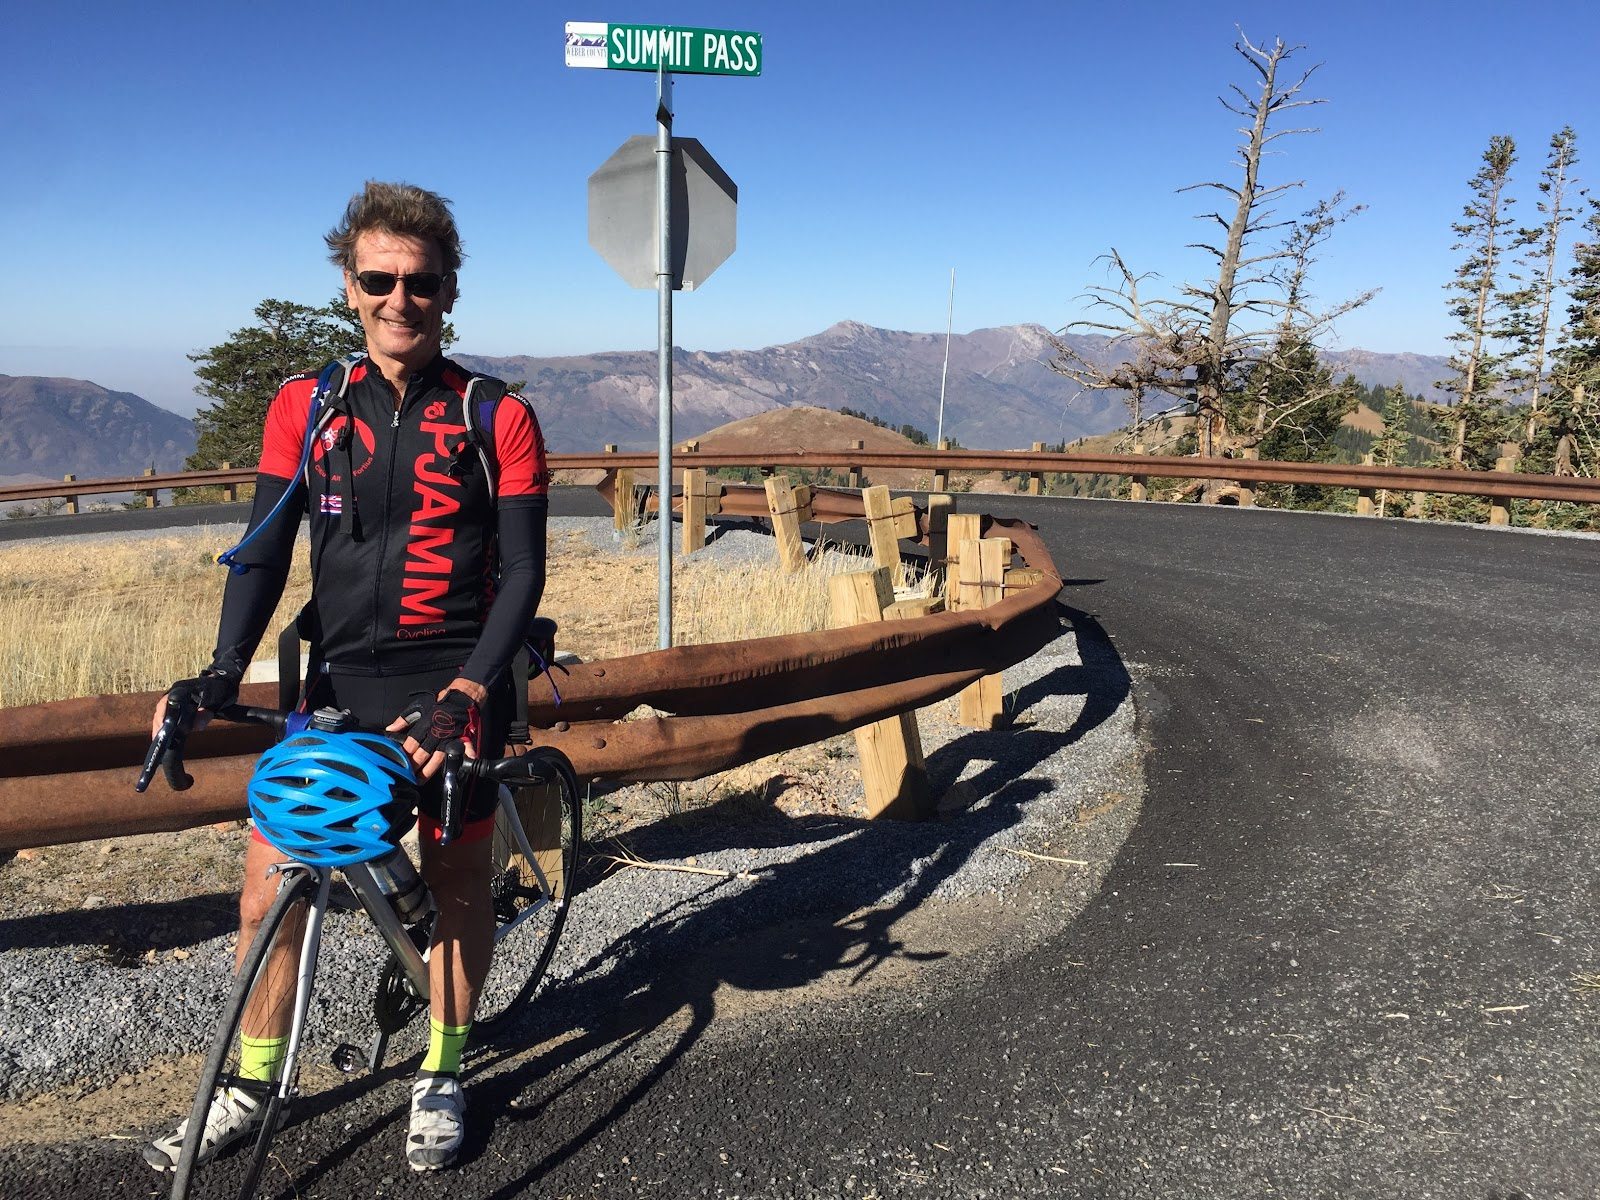 Summit Pass Road Sign with cyclist on Powder Mountain Utah bike climb.